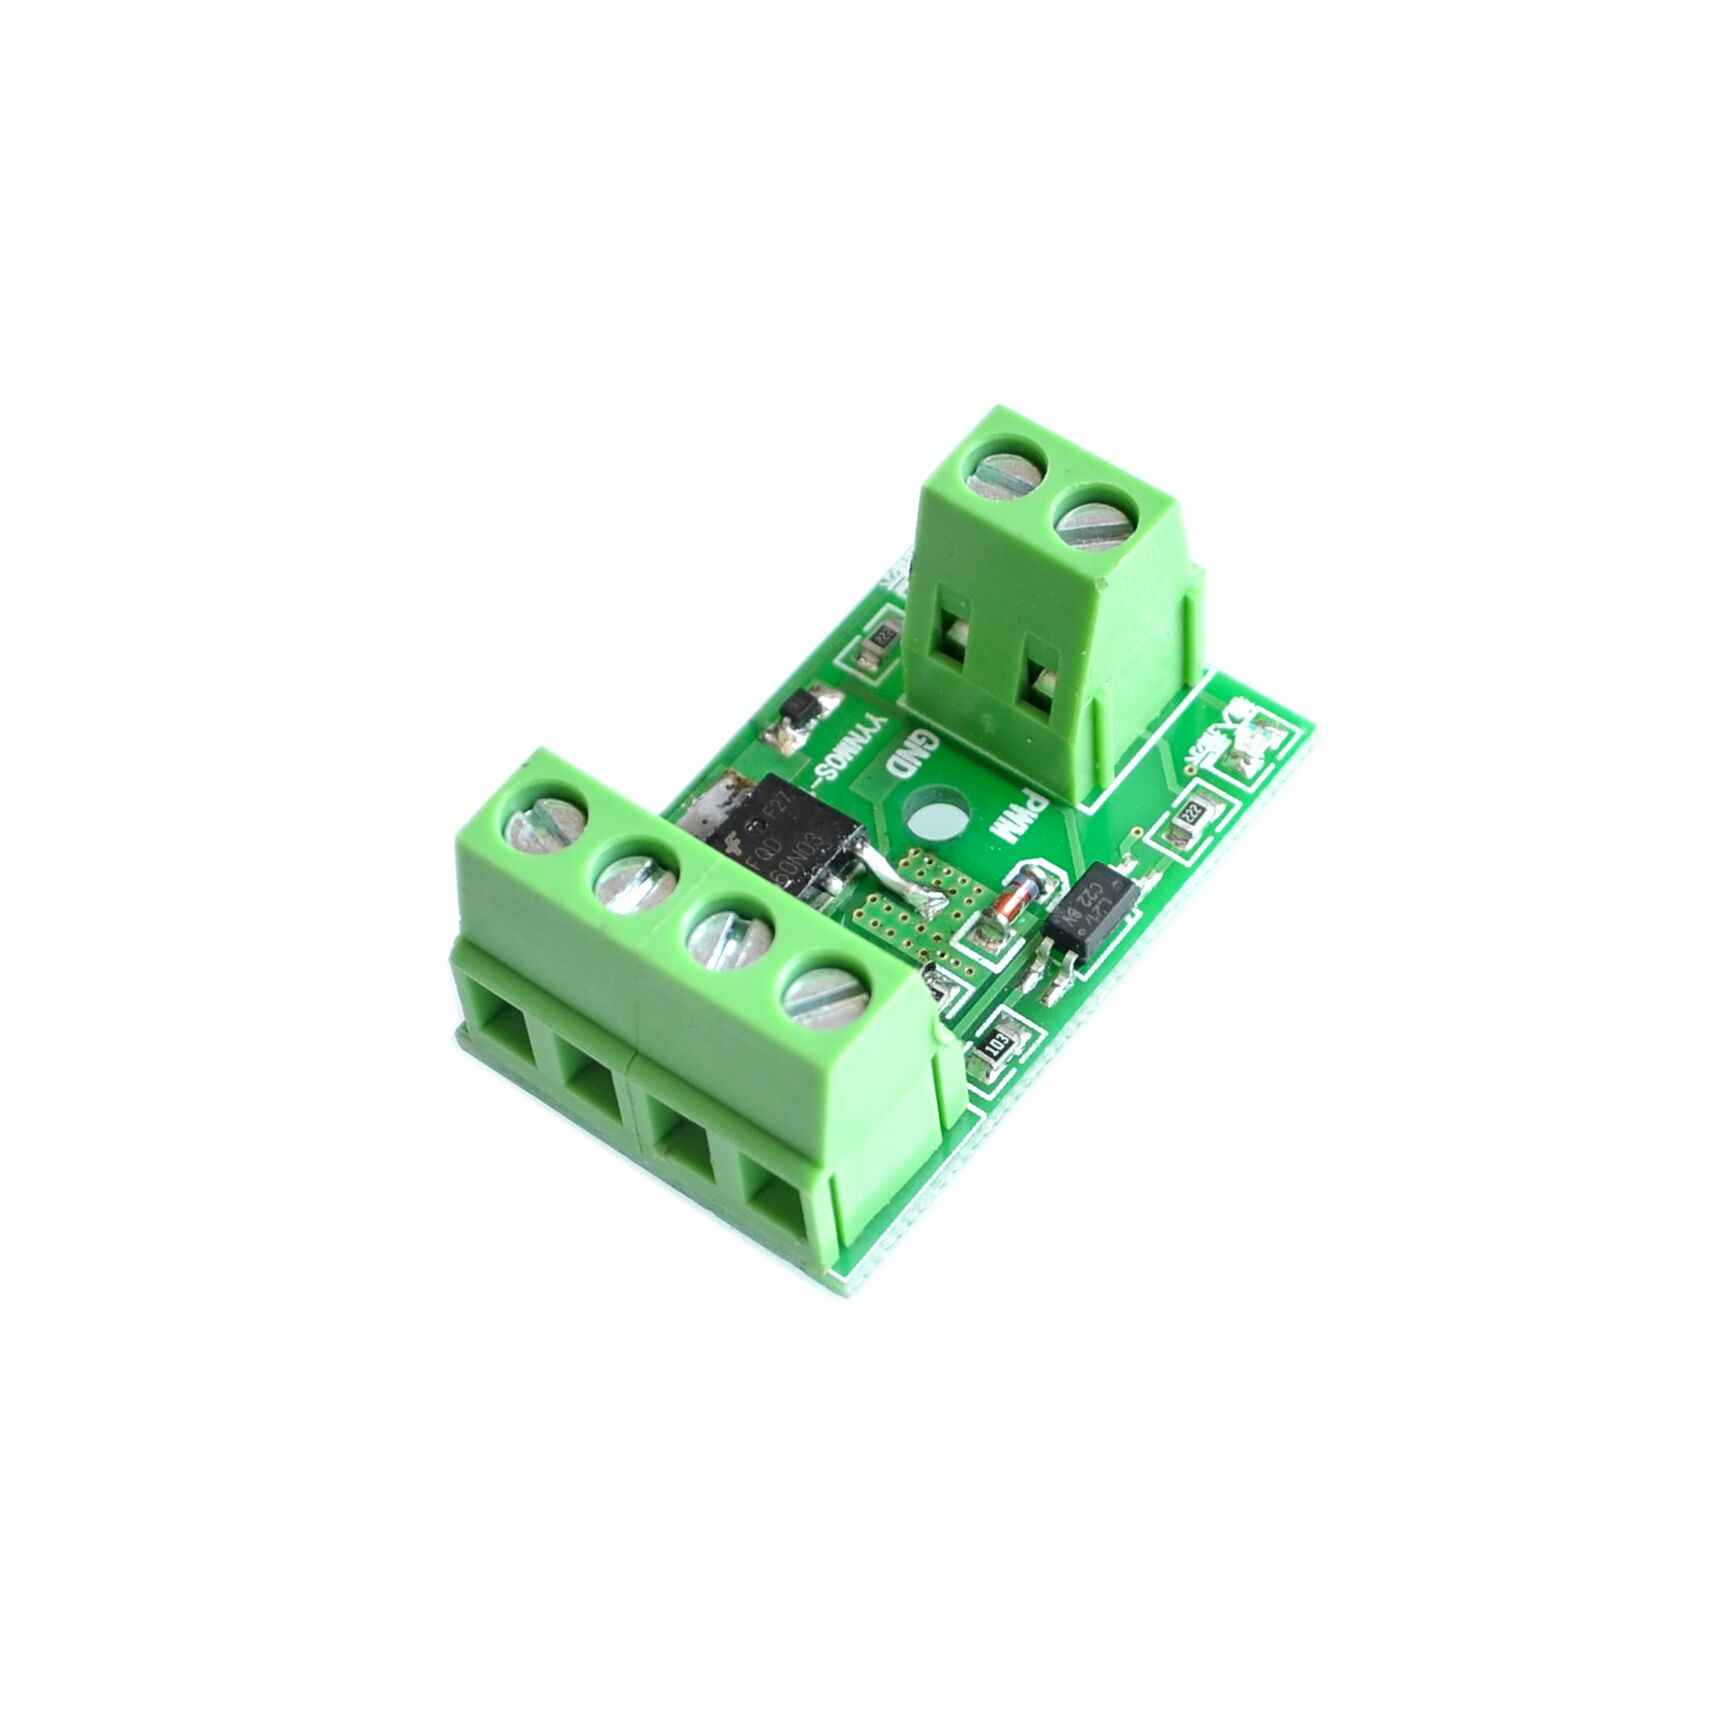 Mosfet mosフォトカプラ絶縁ドライバモジュール電界効果トランジスタトリガスイッチpwm制御ボード3-20v